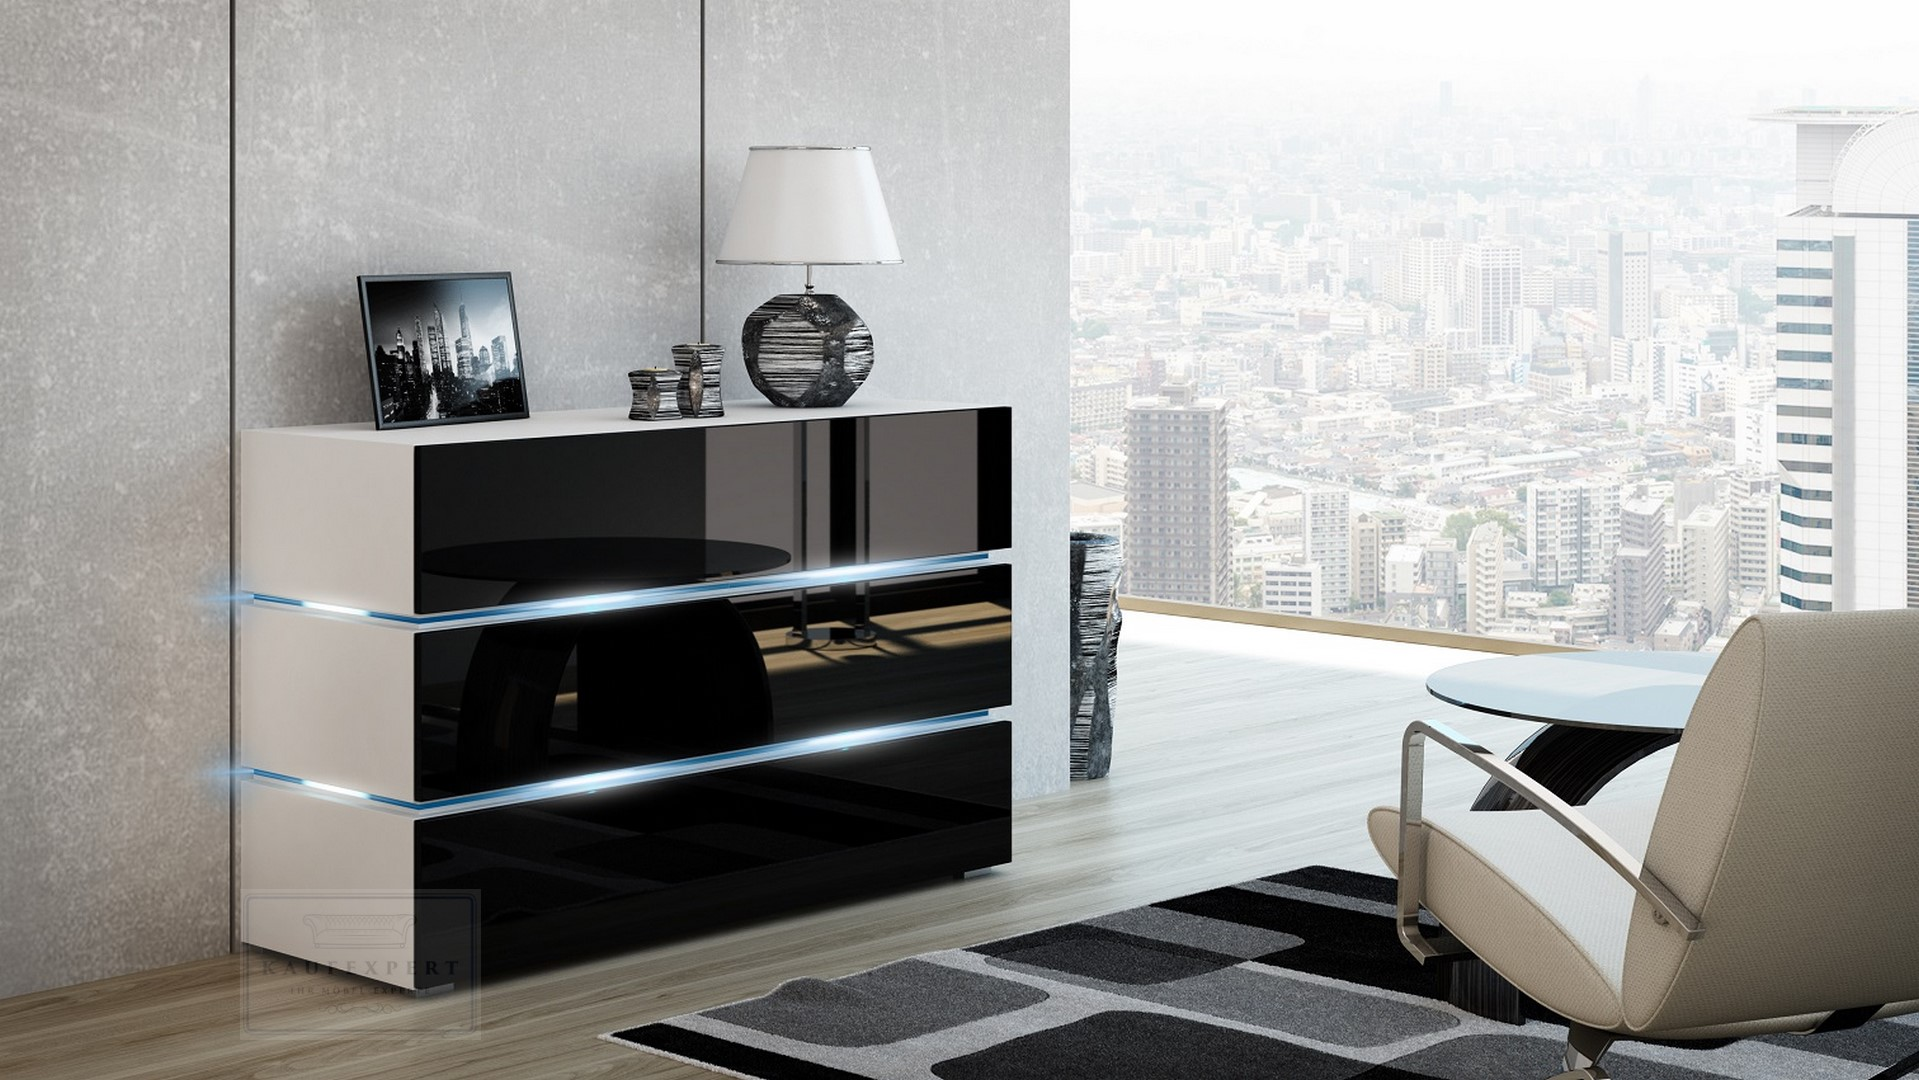 sideboard shine schwarz wei kommode led anrichte wohnwand galaxy sigma ebay. Black Bedroom Furniture Sets. Home Design Ideas